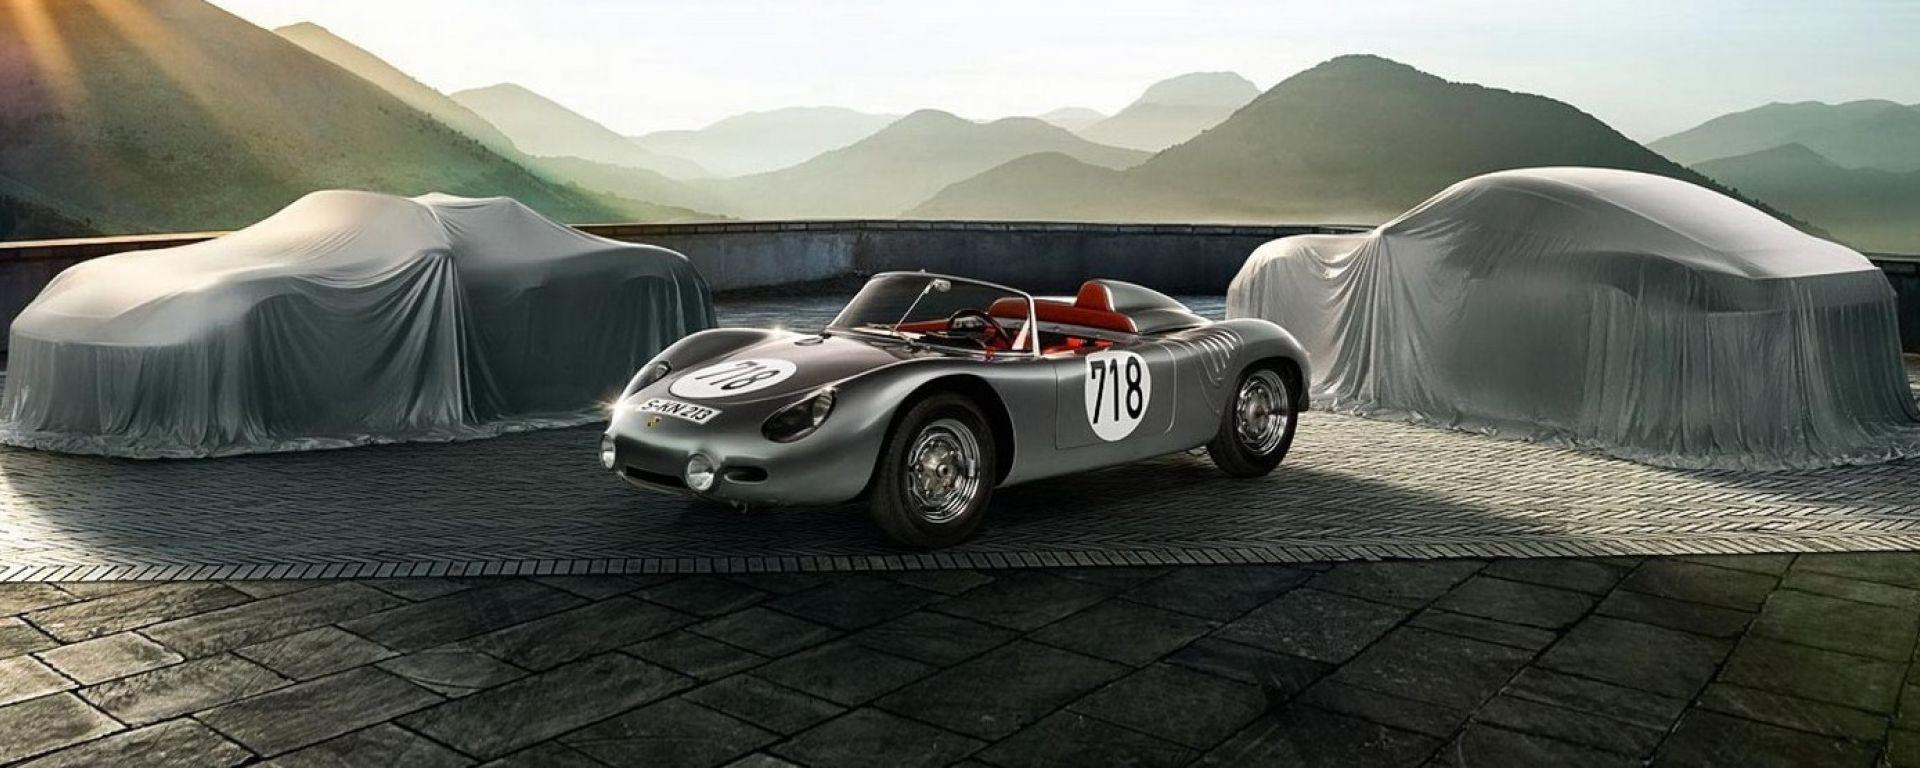 Porsche 718 Boxster e 718 Cayman: il video teaser